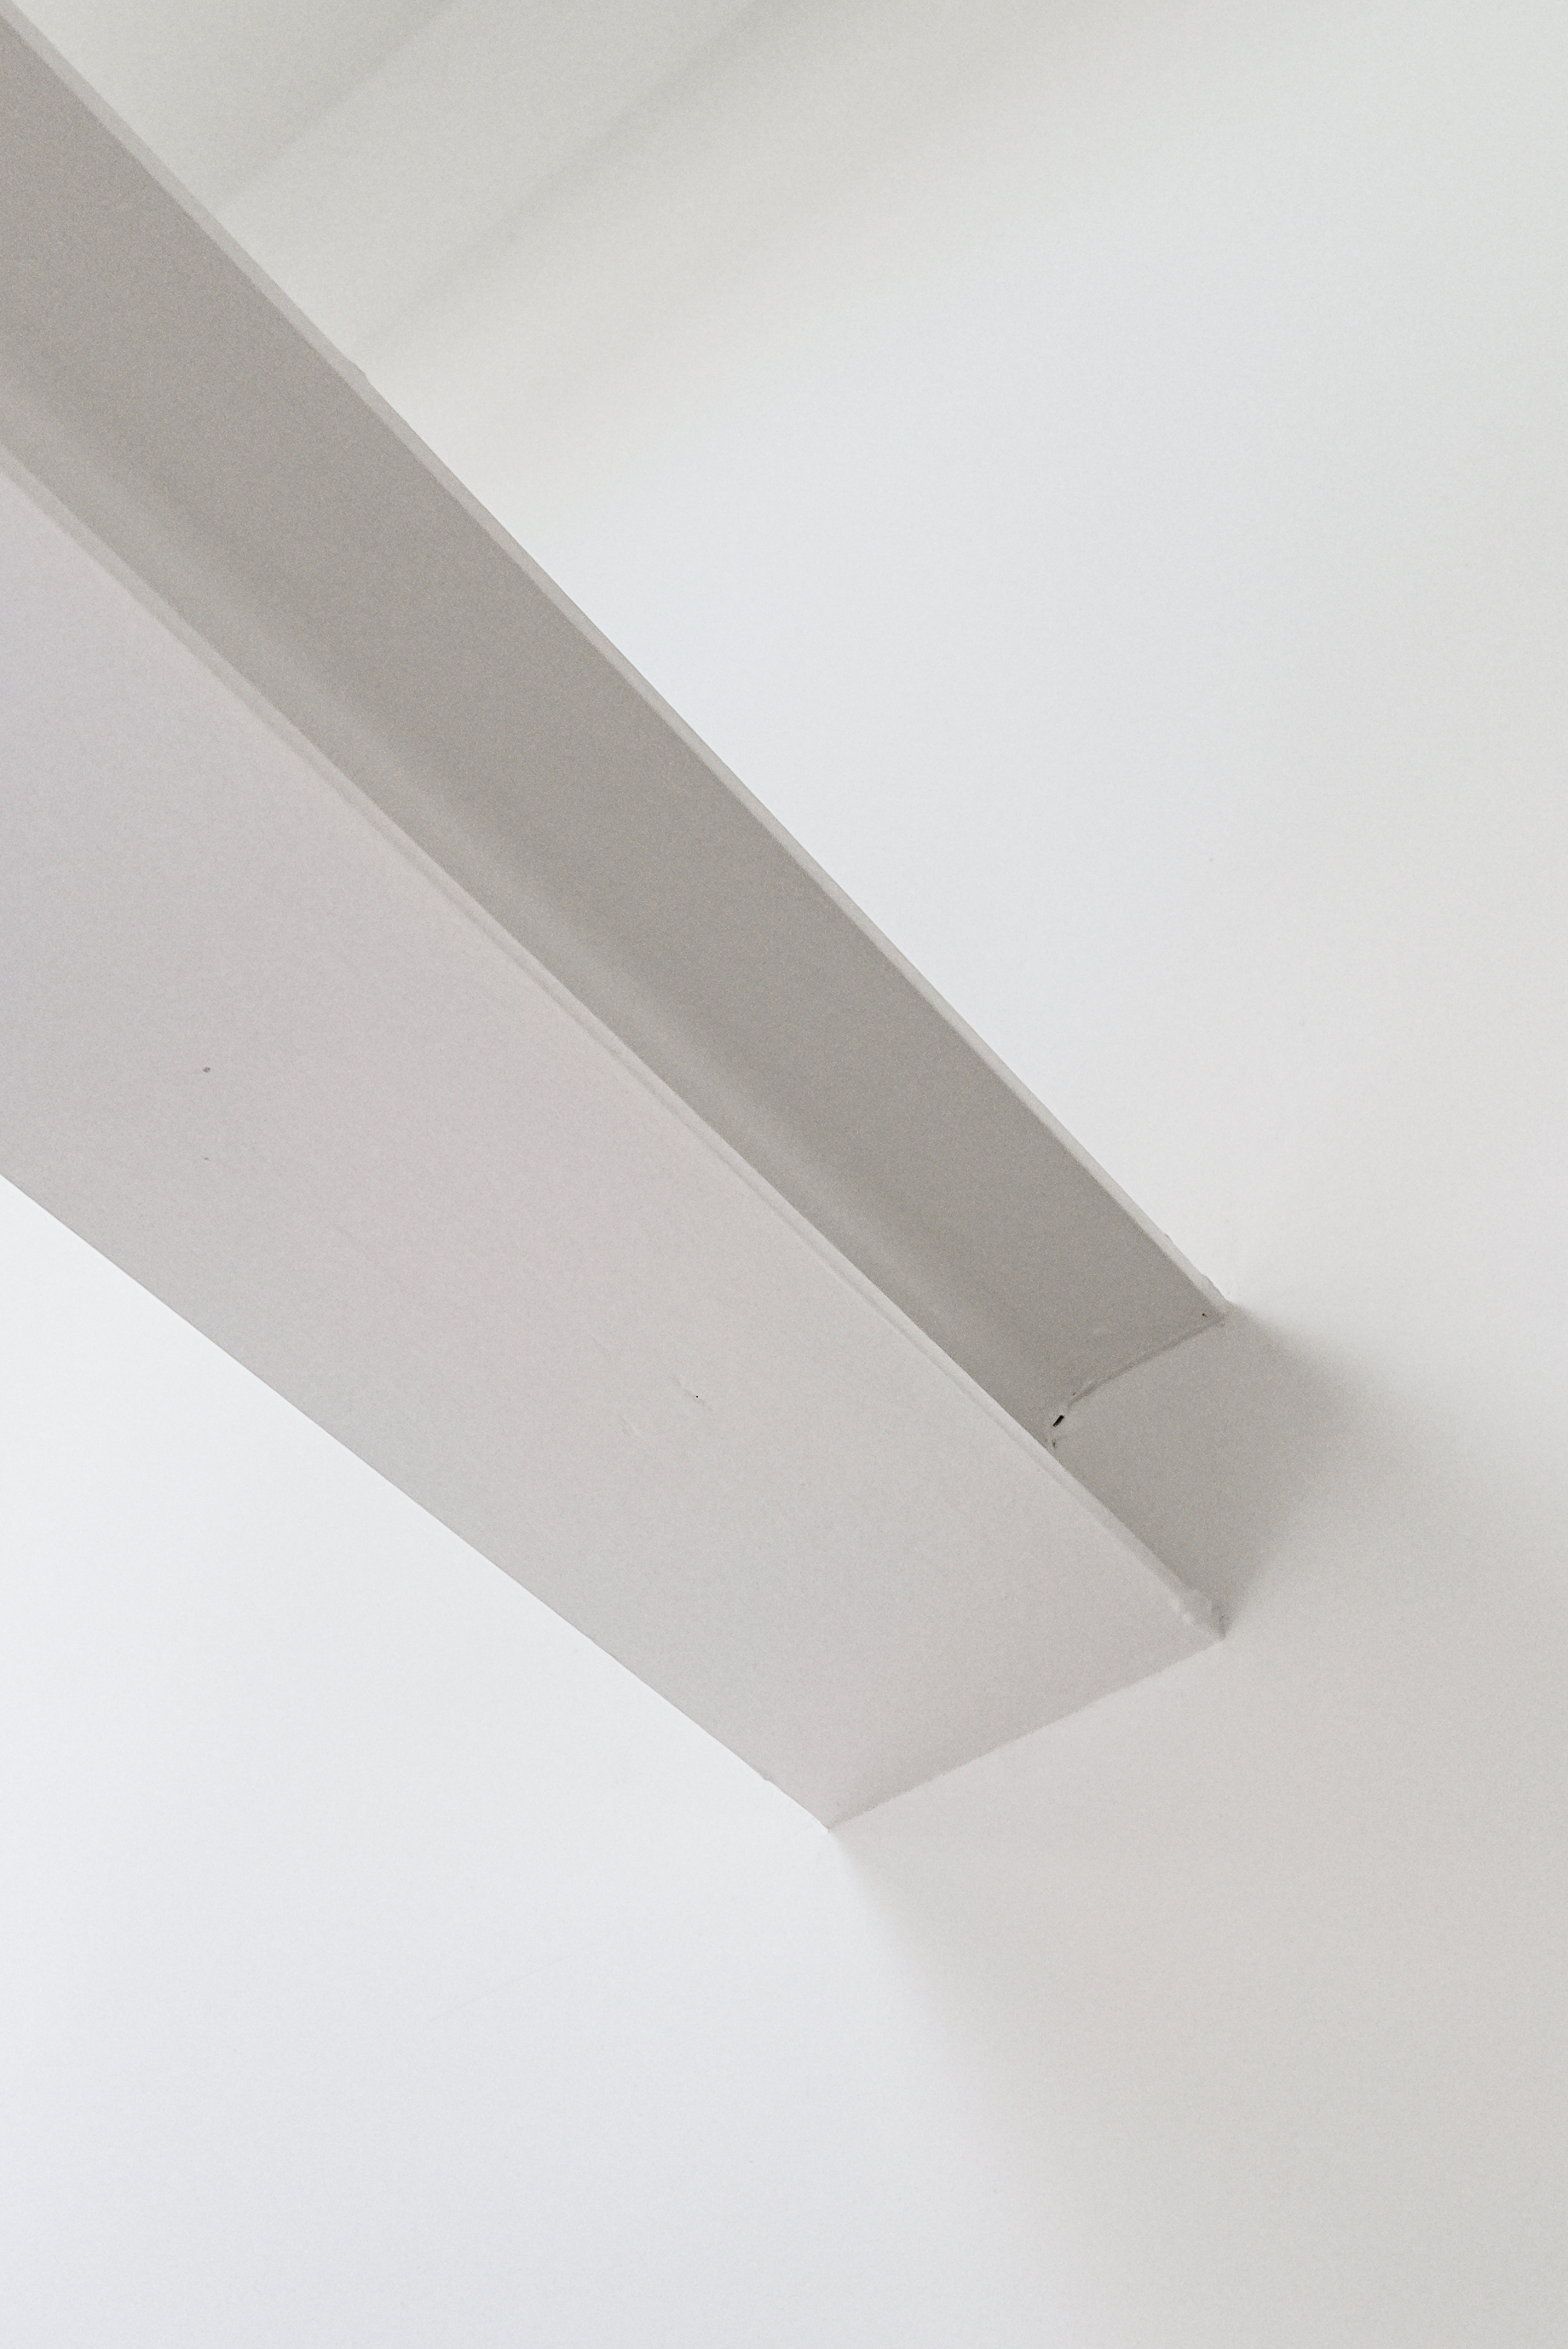 <p>Detail staalconstructie</p>